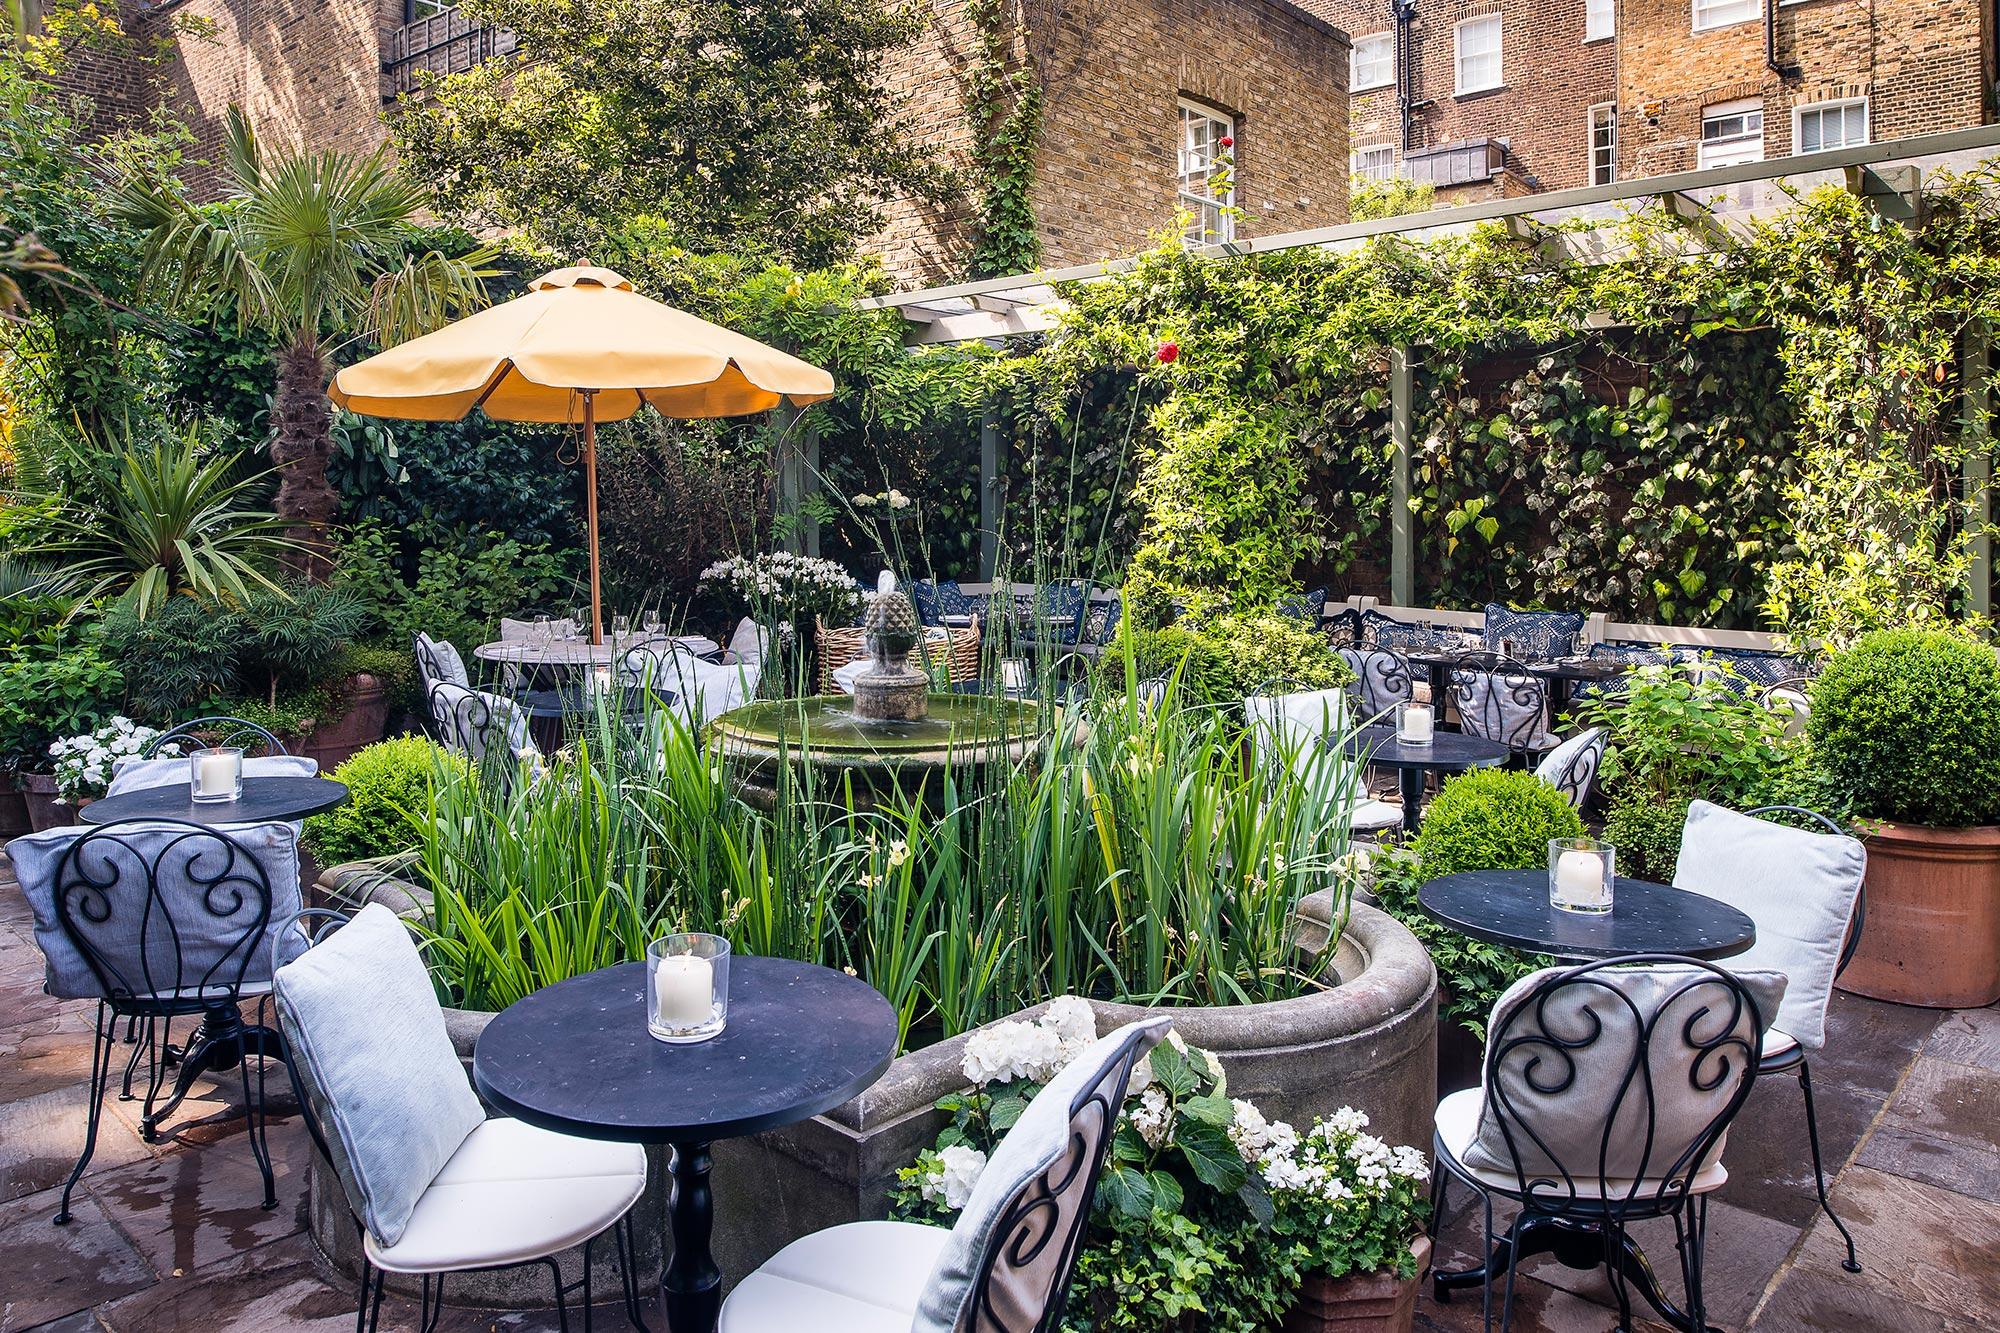 The-Ivy-Chelsea-Garden-Summer-Garden-13-1.jpg